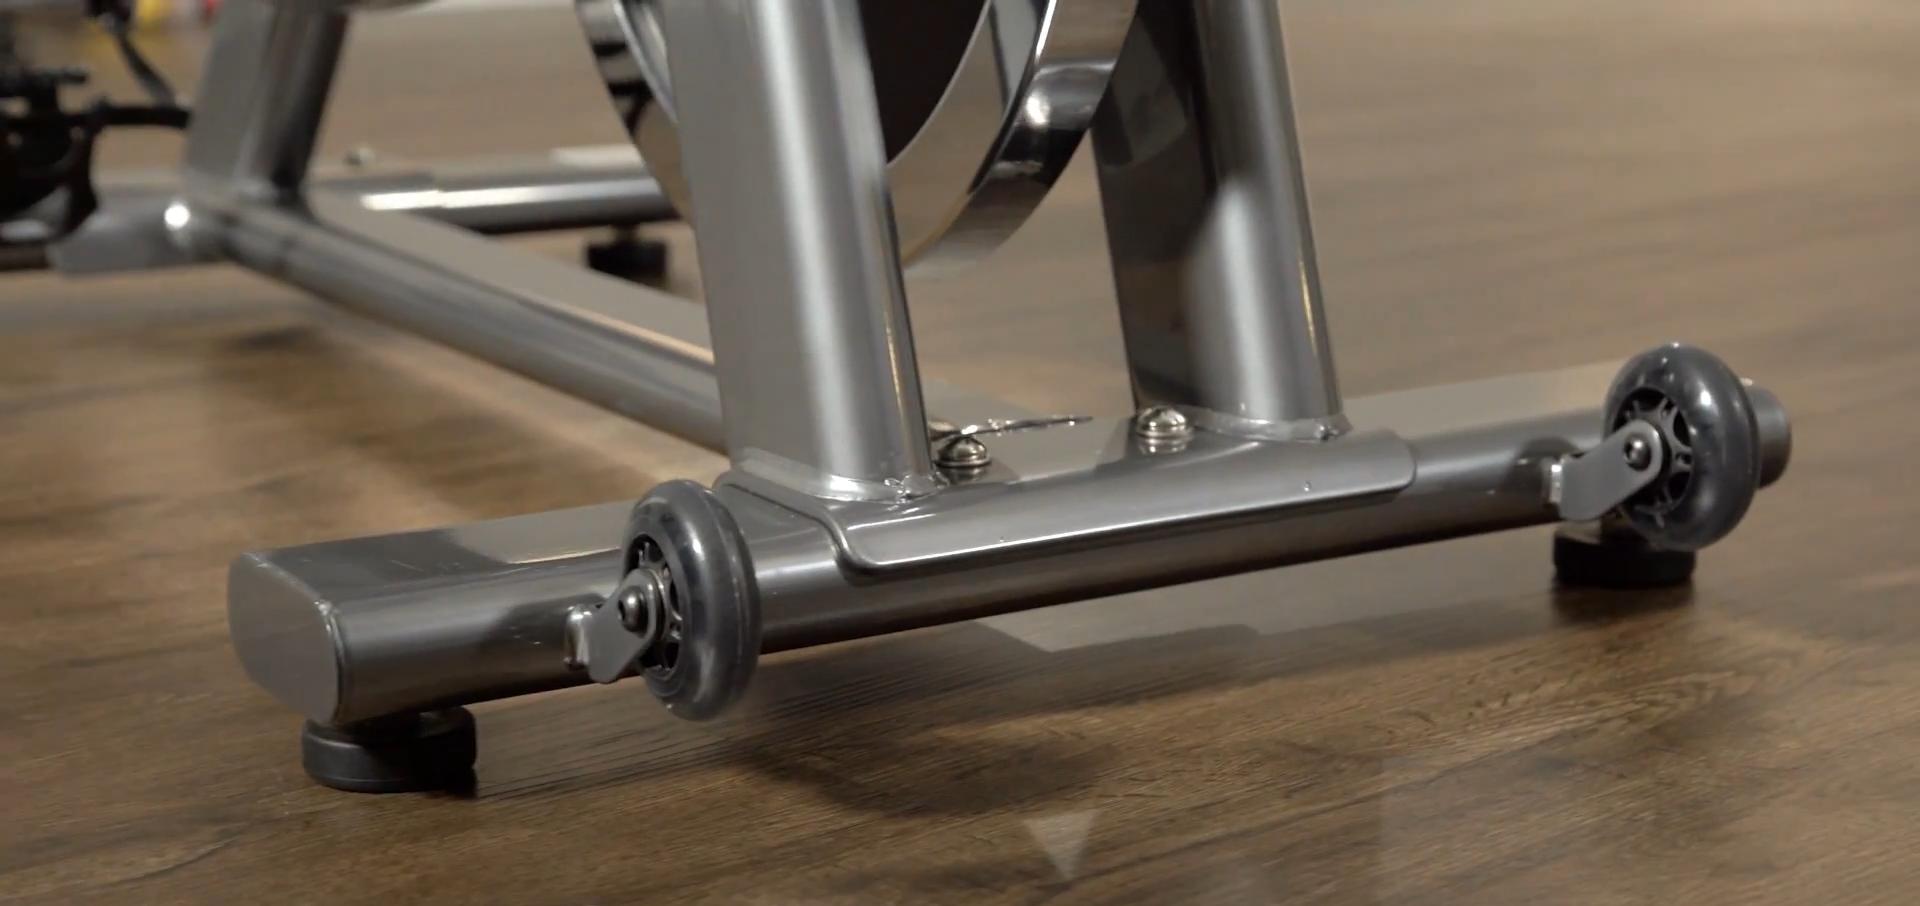 Sunny Health Recumbent Bike Star Trac Spinner Pro Review Asuna